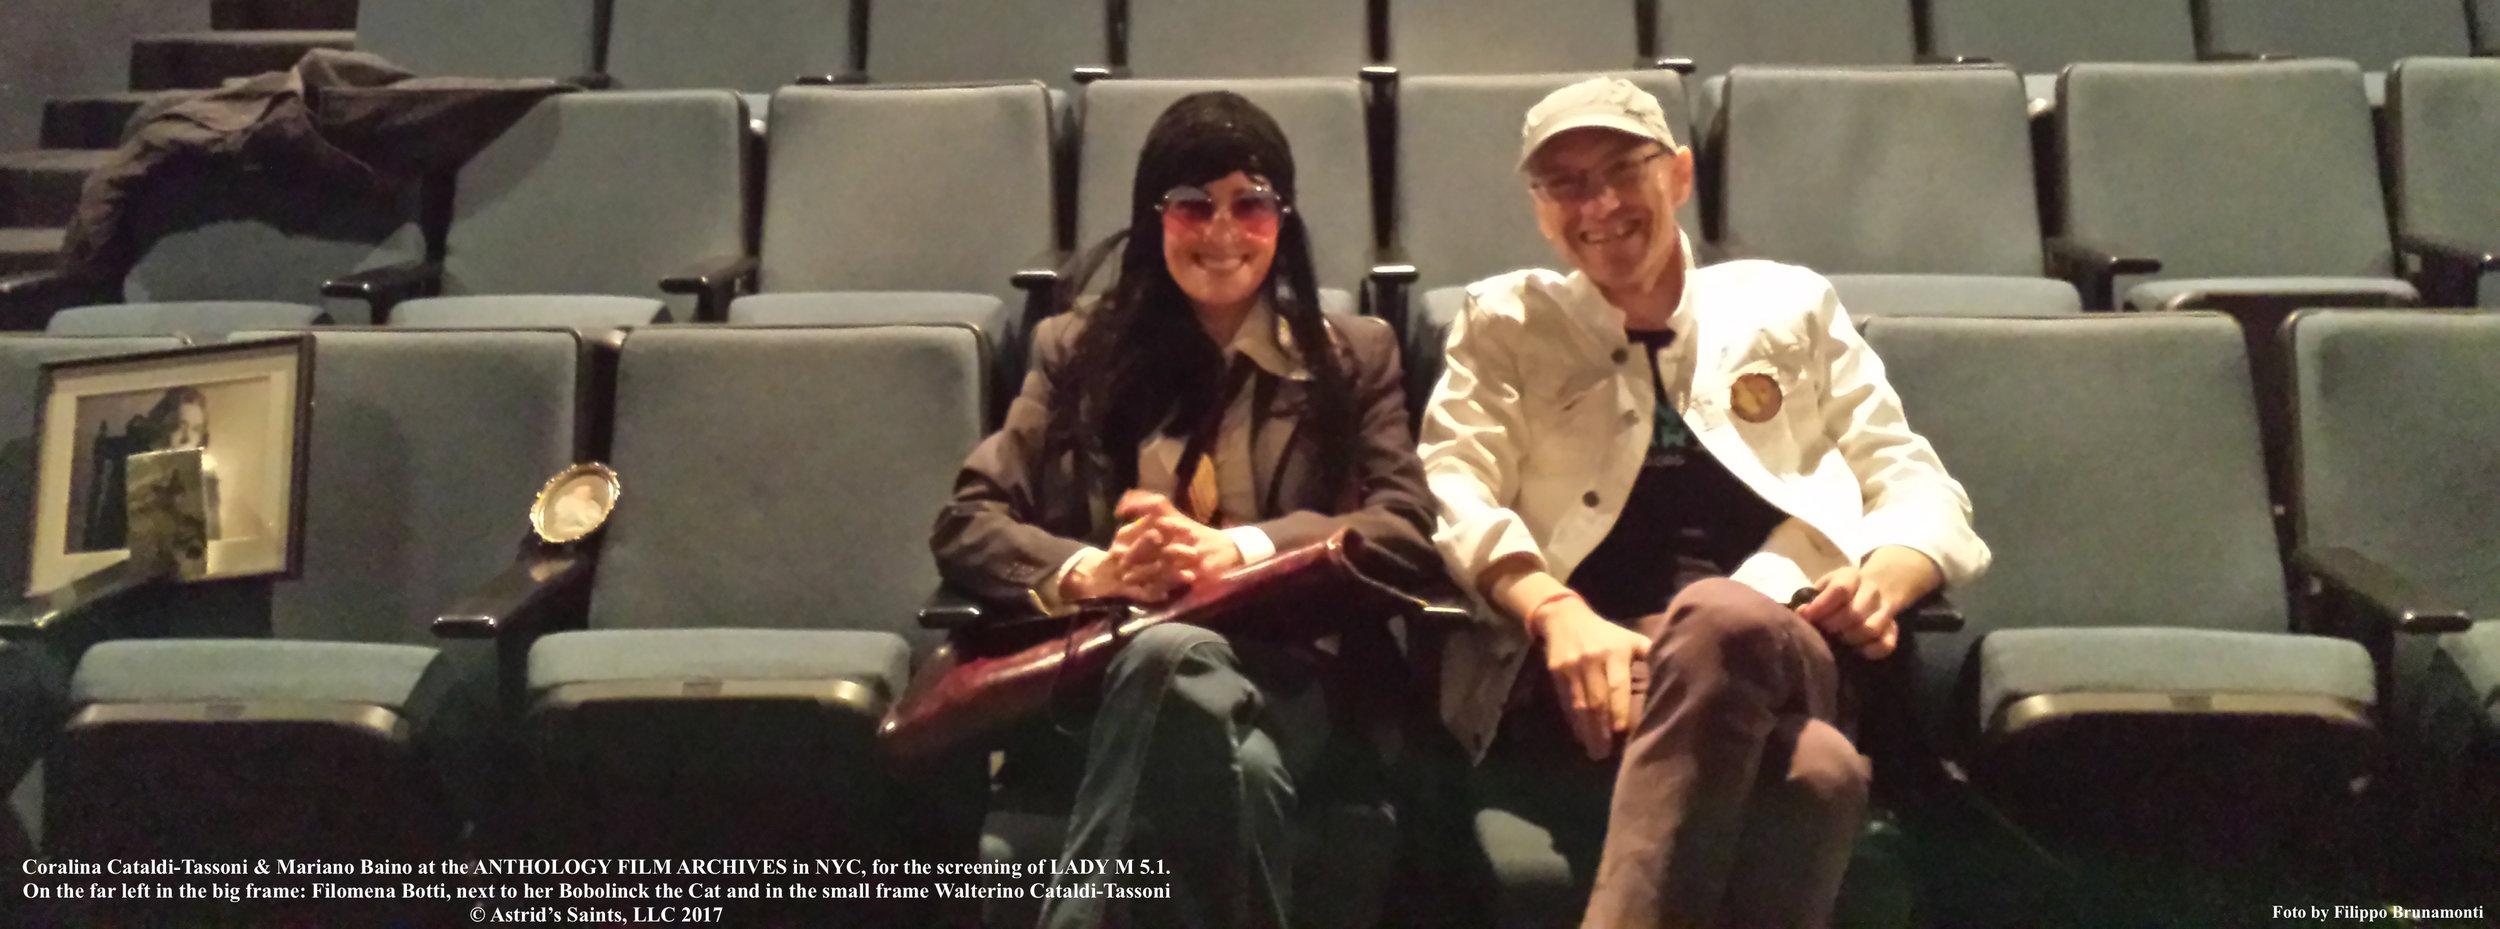 Coralina Cataldi-Tassoni and Mariano Baino at the LADY M 5.1 screening at The Anthology Film Archives May 6th 2017 4.jpg